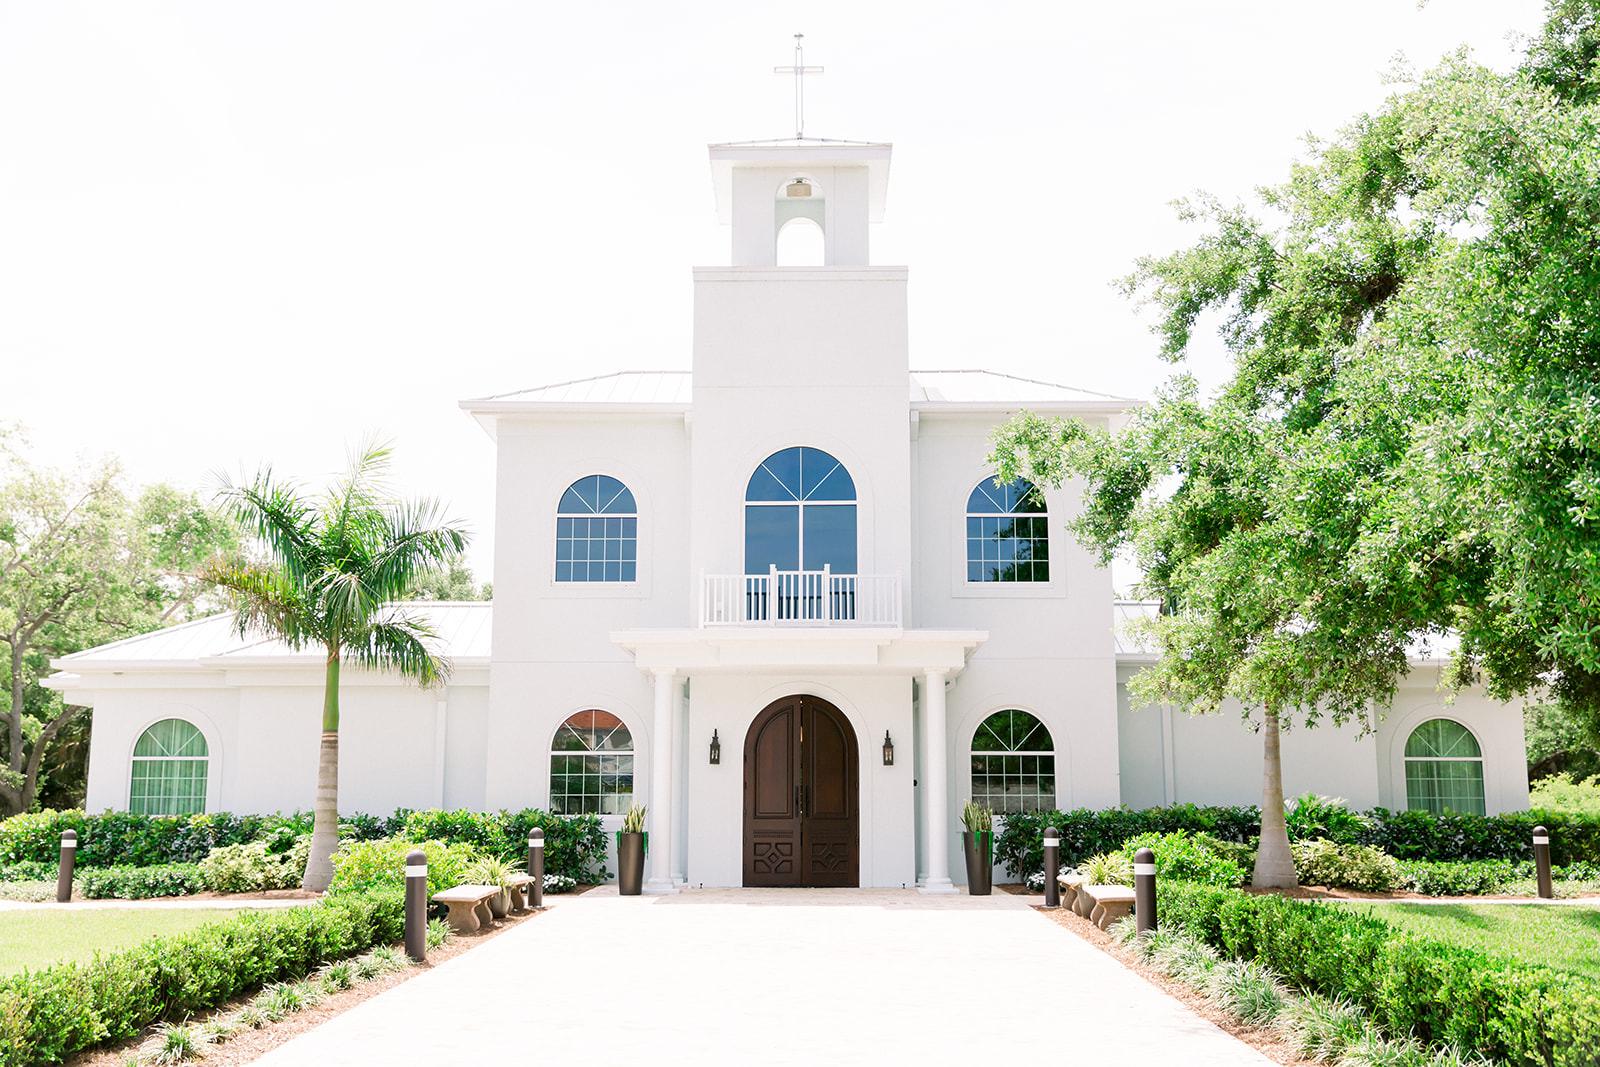 Florida Wedding Ceremony, Clearwater Boutique Wedding Venue Harborside Chapel | Tampa Bay Wedding Photographers Shauna and Jordon Photography